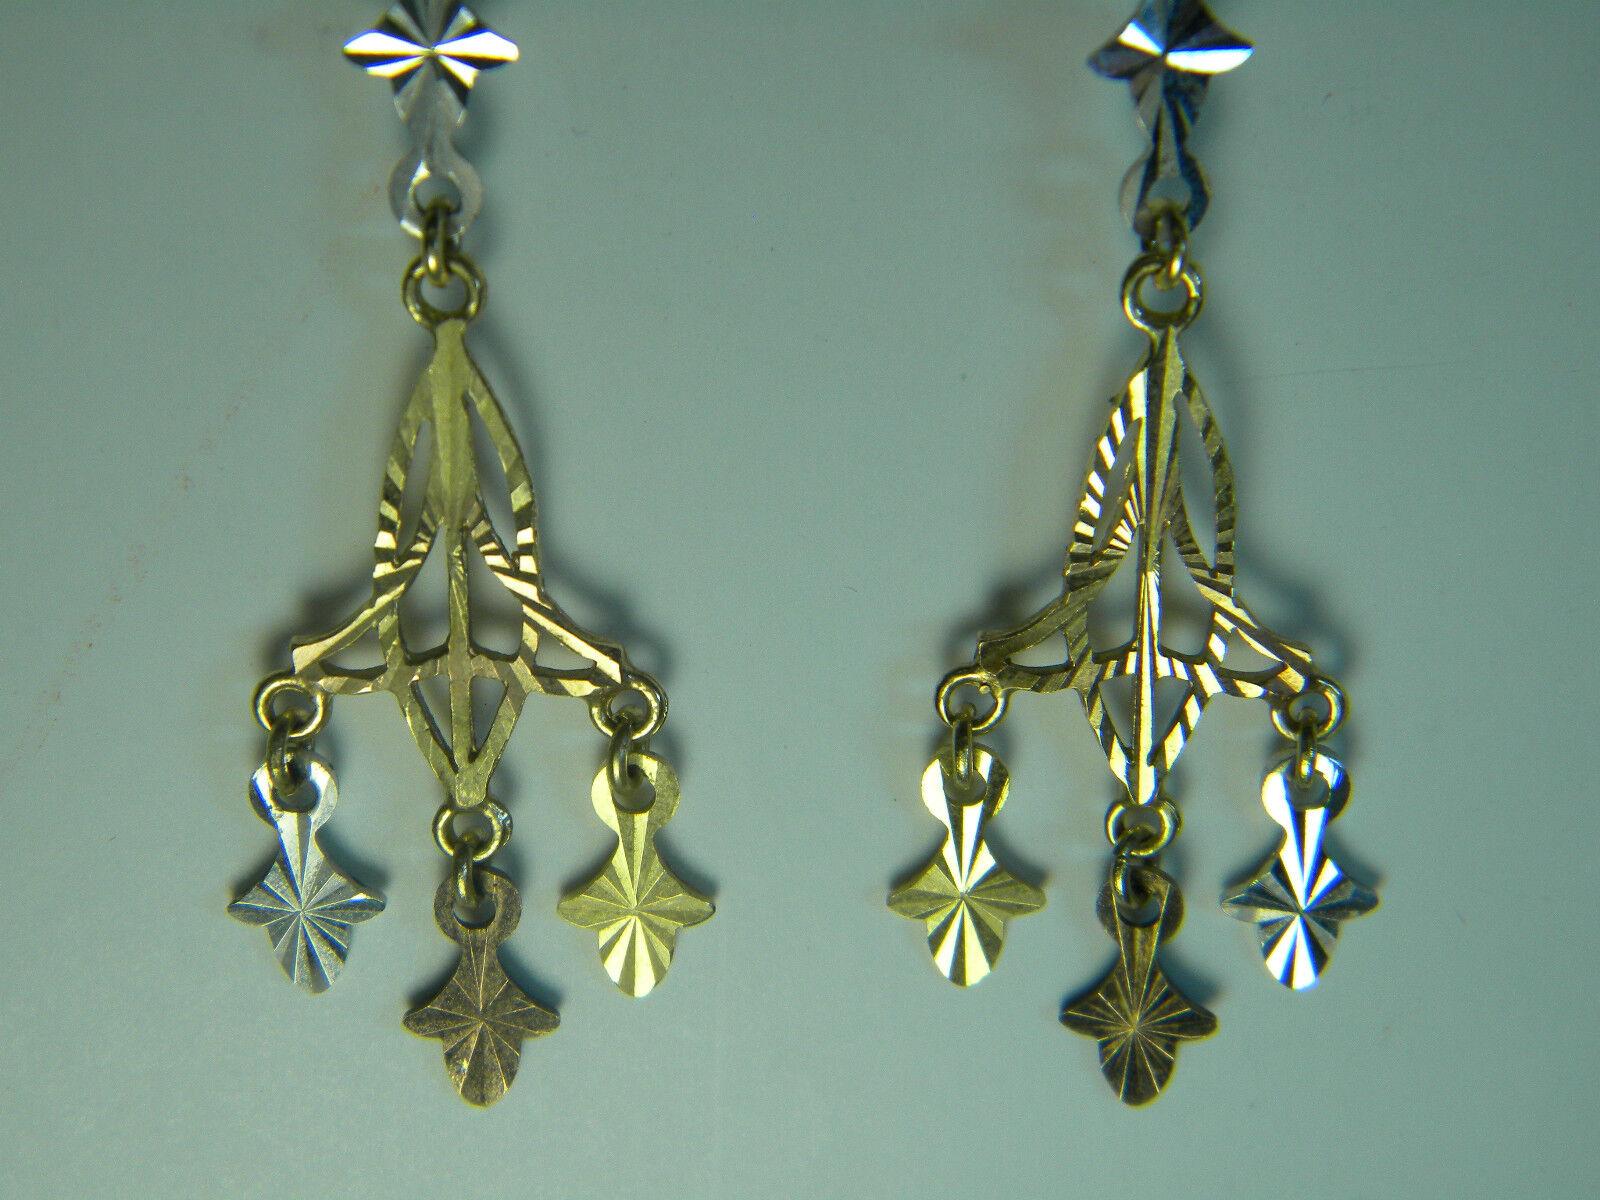 dce45c57528ba 14 gold Earrings Dangle Knot Trinity Filigree Chandelier Kt White ...